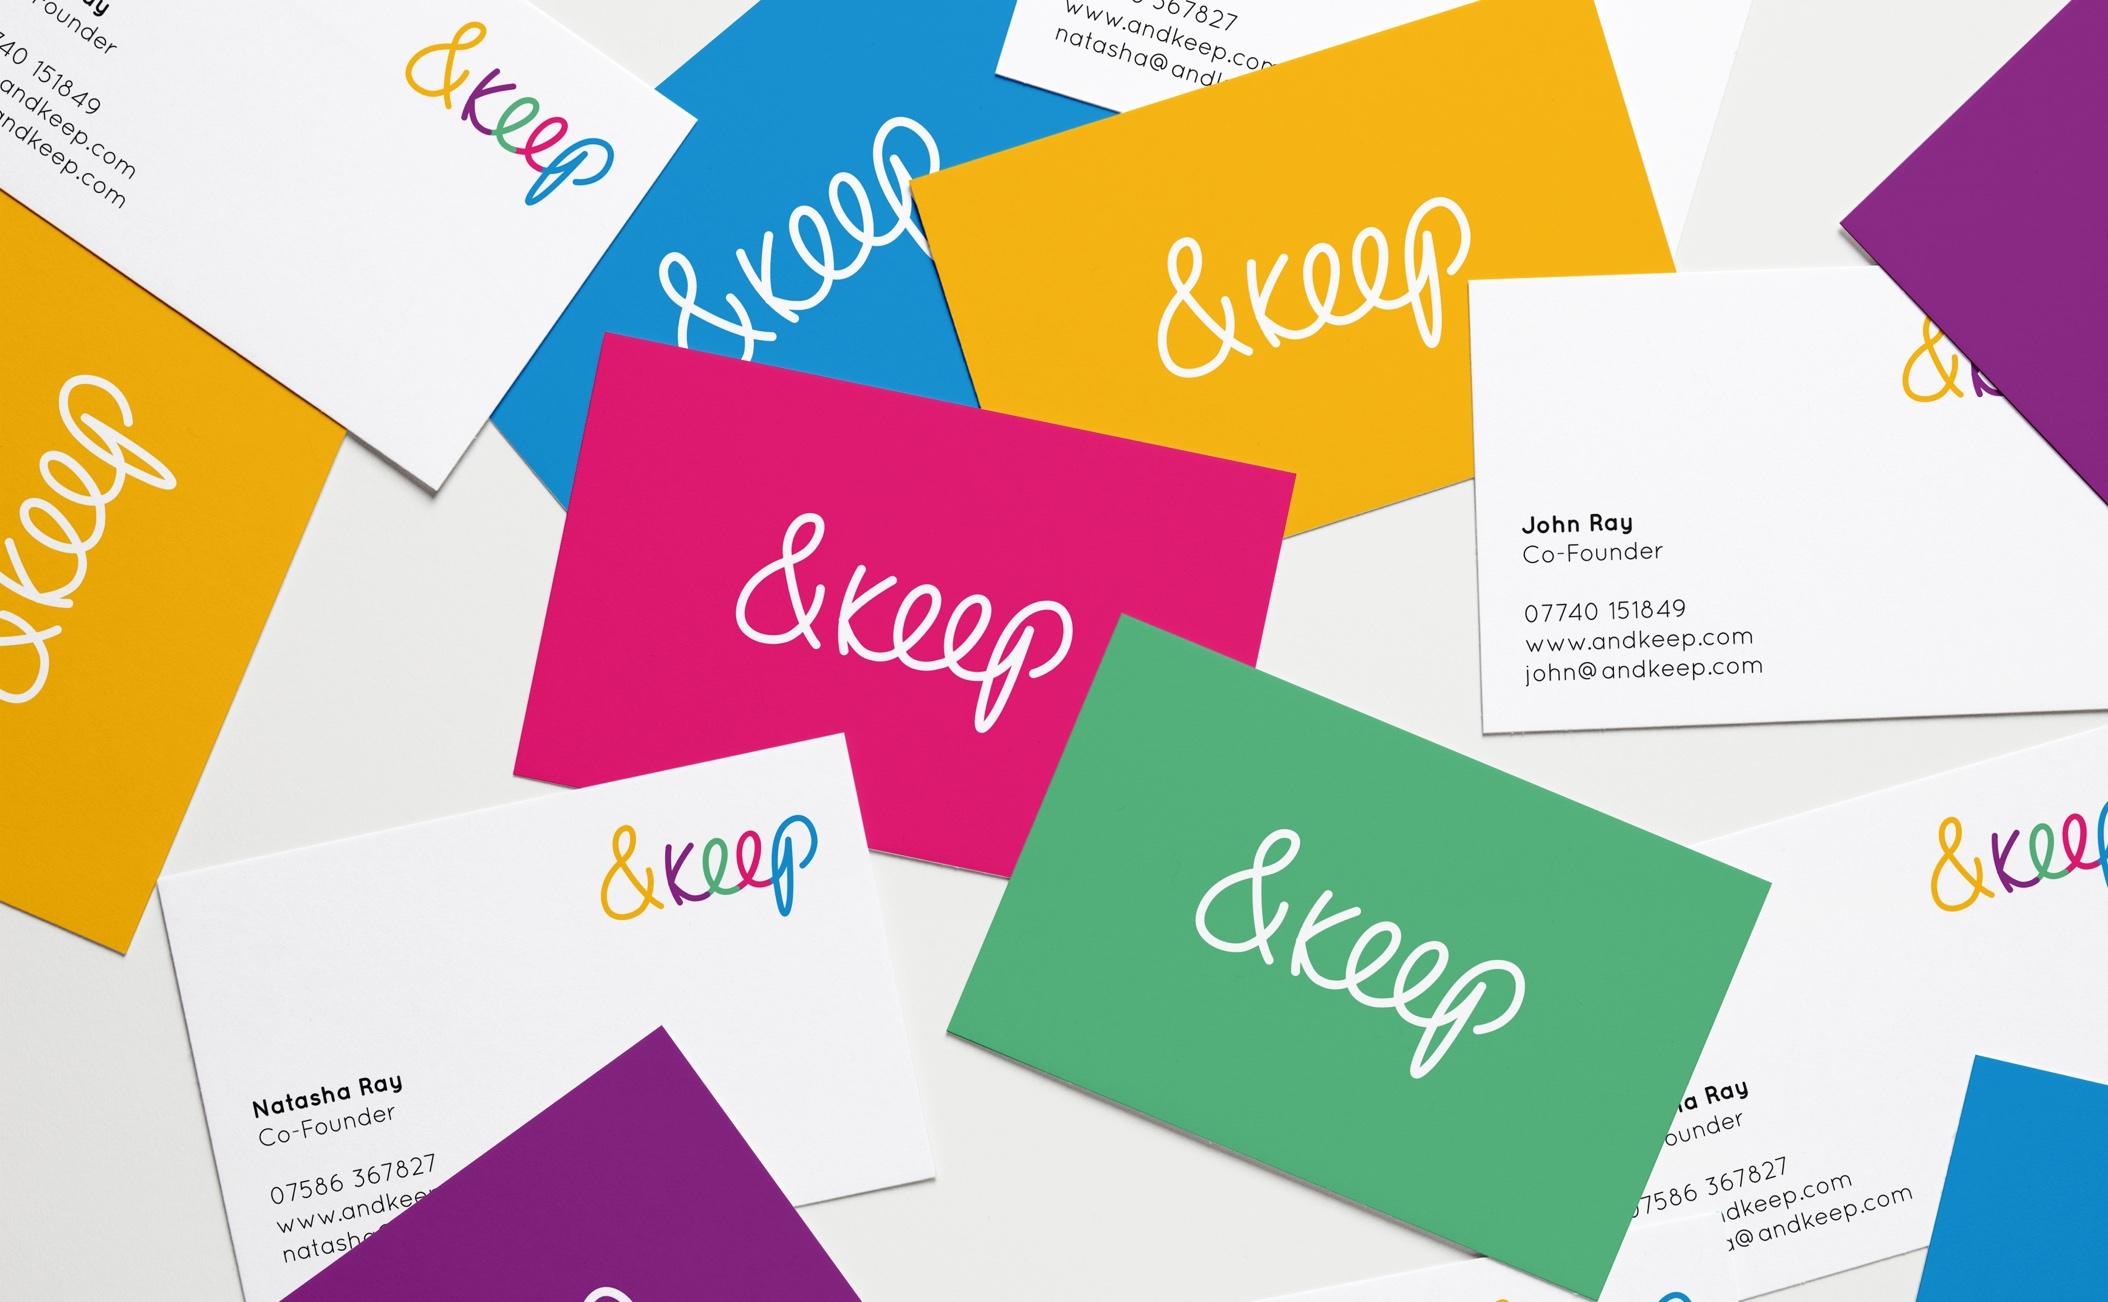 &Keep-Biz Cards.jpg